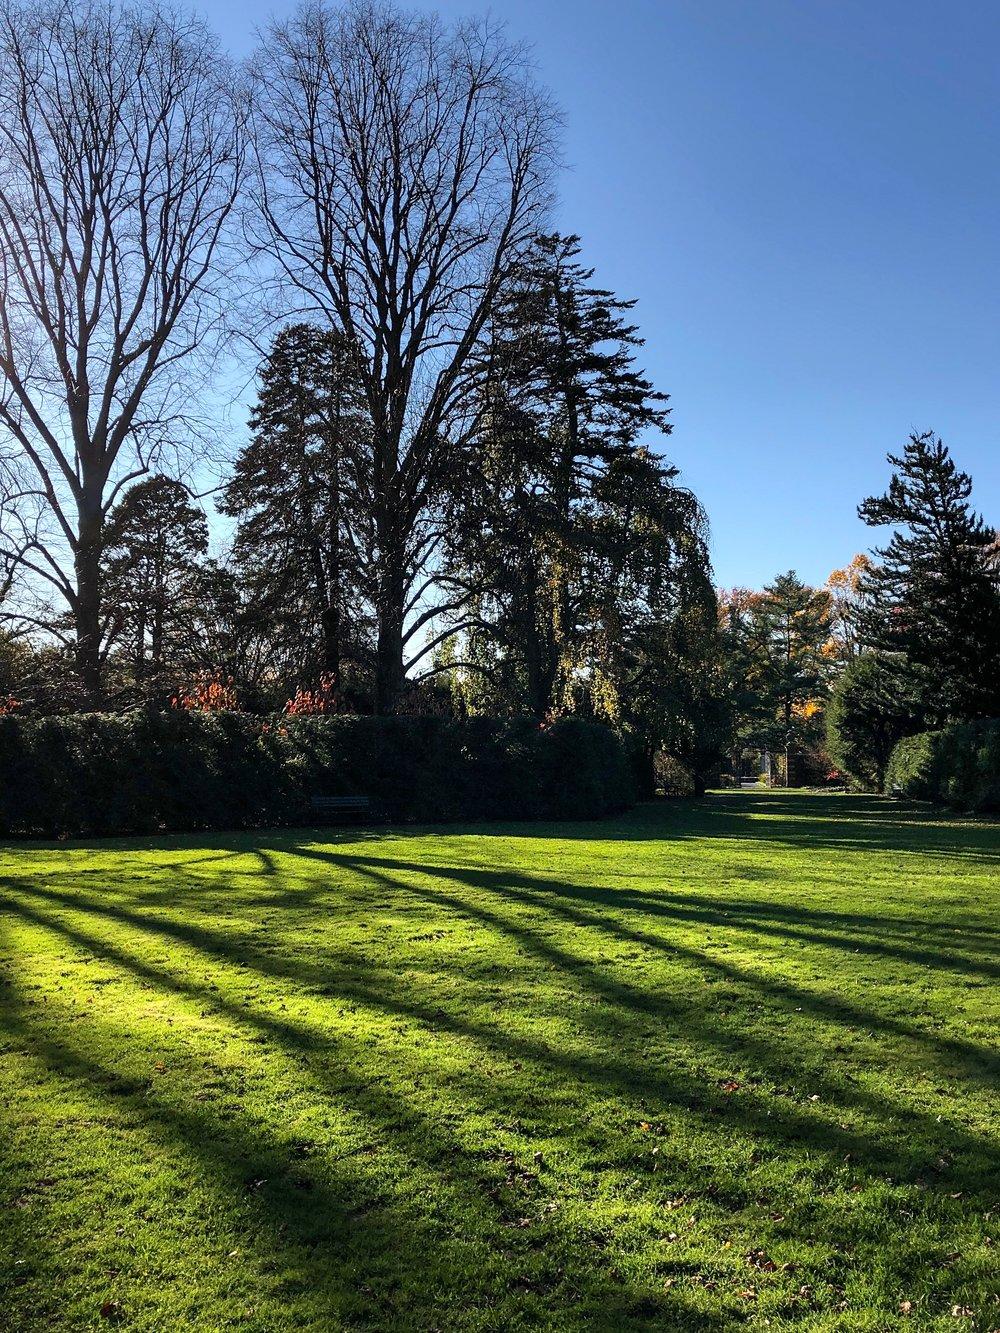 __@ Lawn backyard_Old Westbury Gardens_11.11.18.jpg